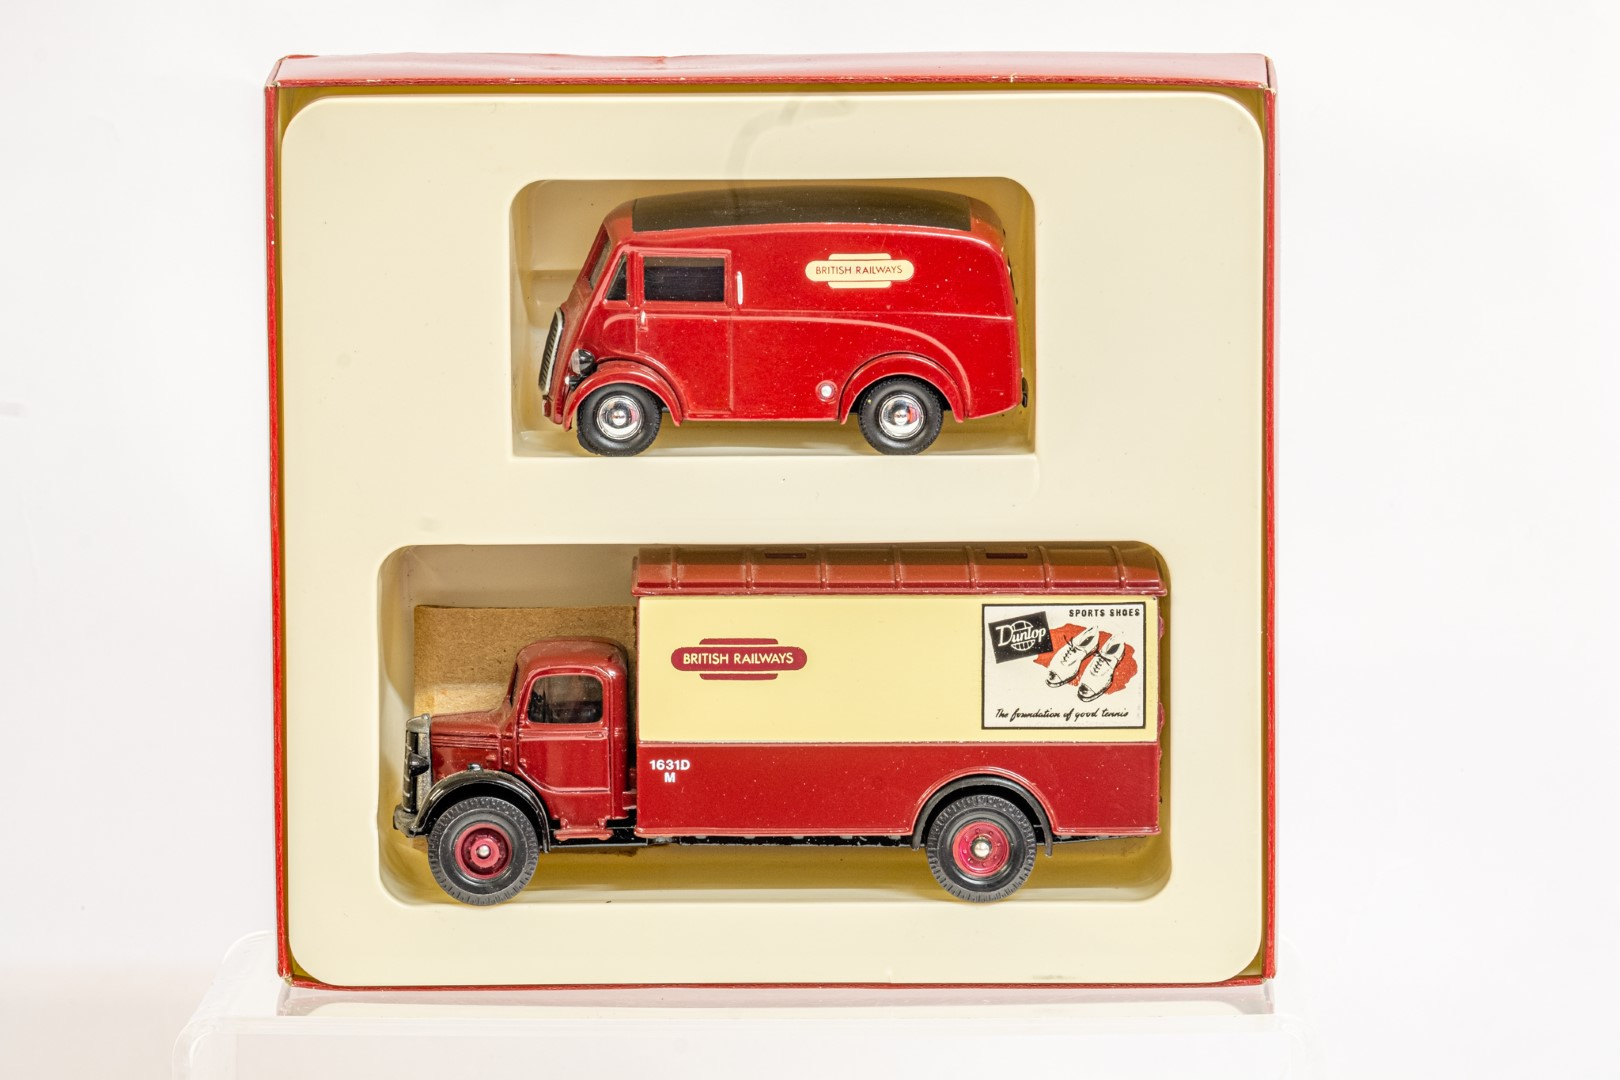 Corgi & Lledo 2 Boxed Models - Service Vans Of the 50's & 60's & Sentinel Ballast - Image 6 of 12